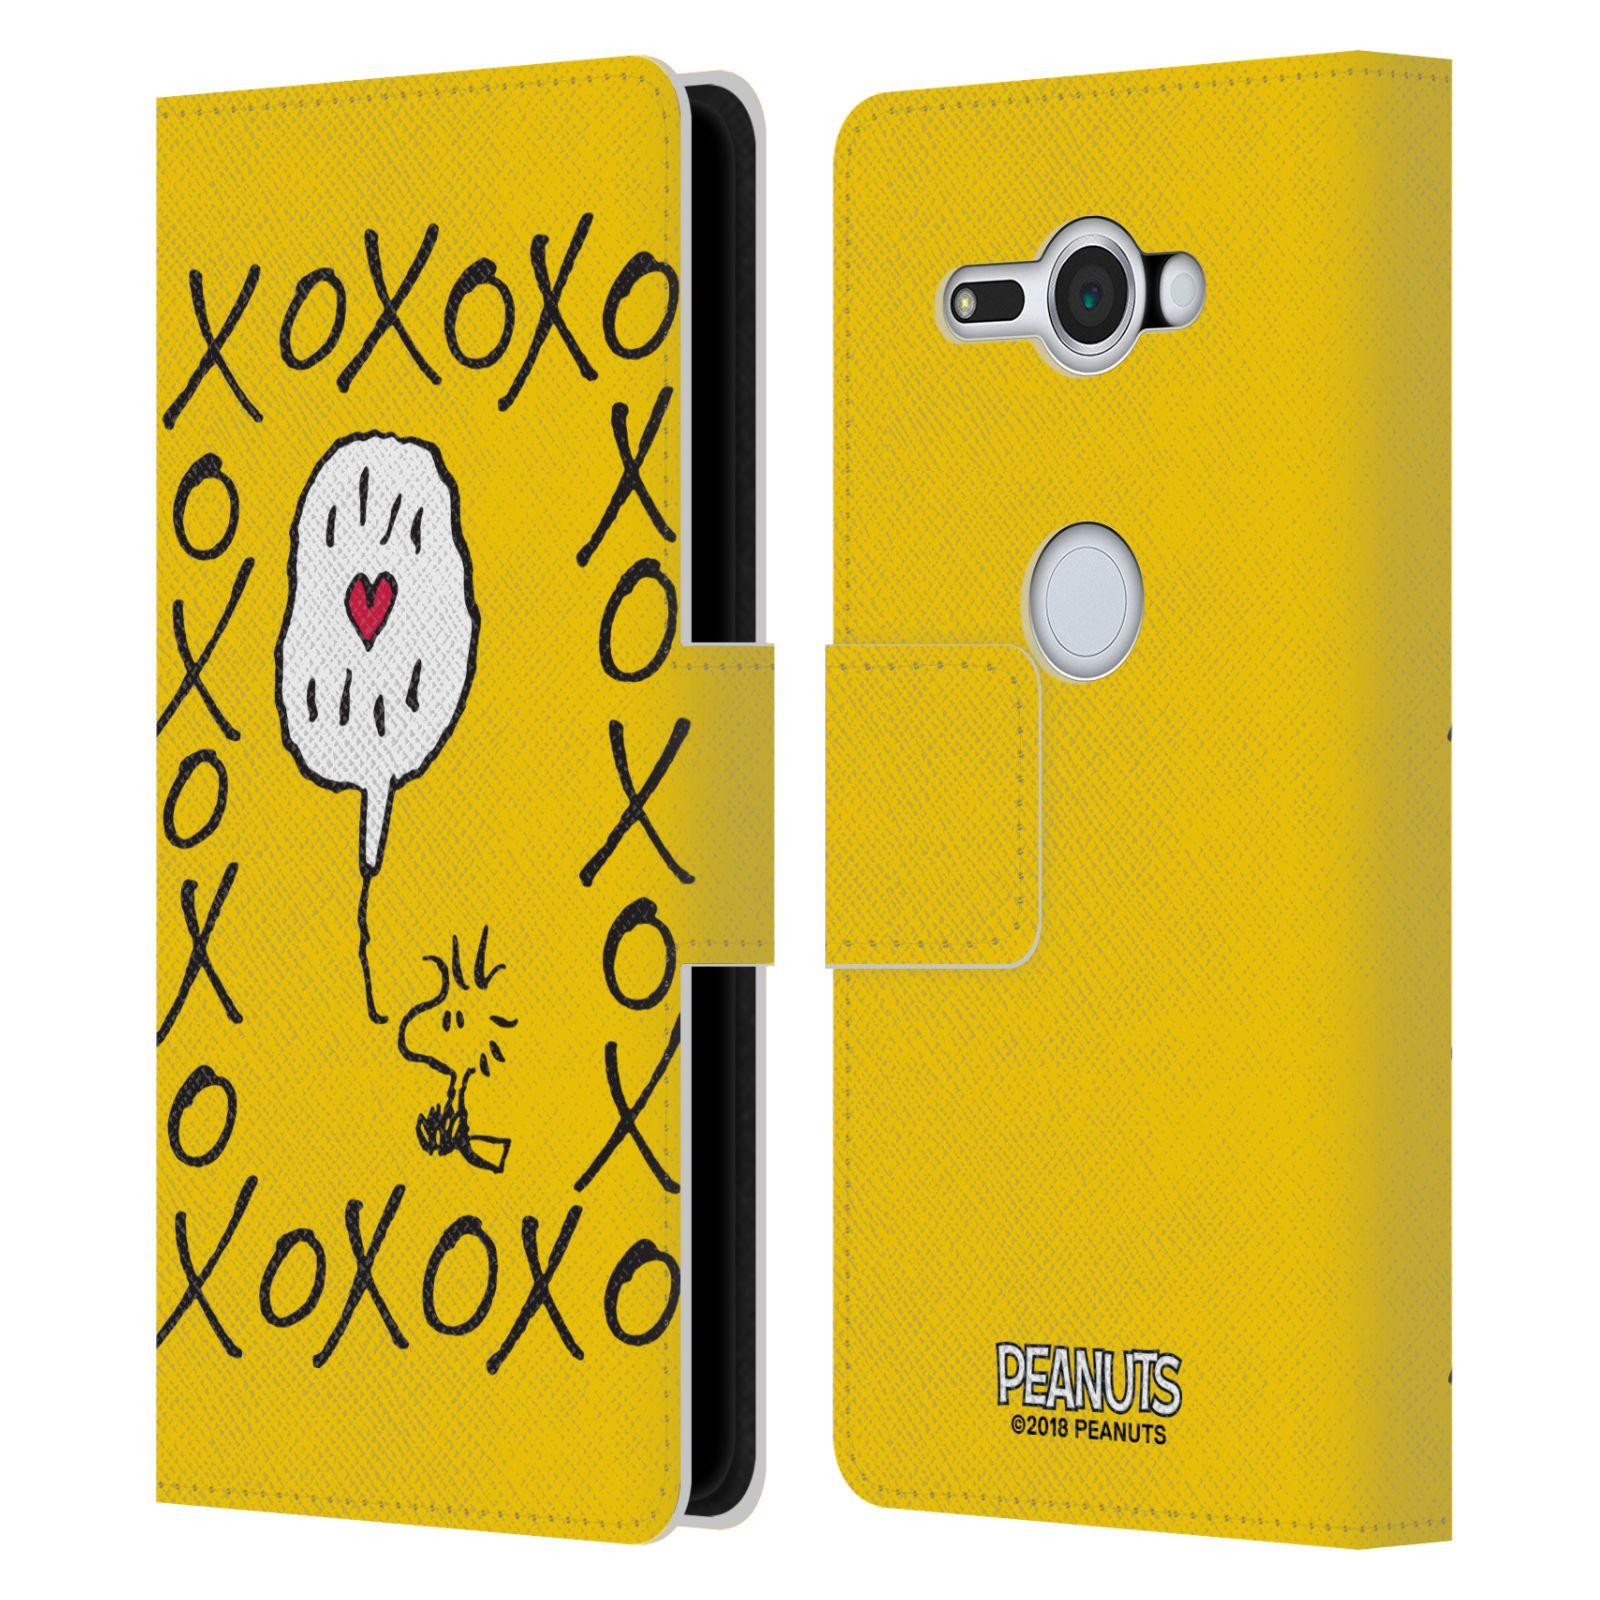 Pouzdro na mobil Sony Xperia XZ2 Compact - Head Case - Peanuts - Woodstock ptáček XOXO